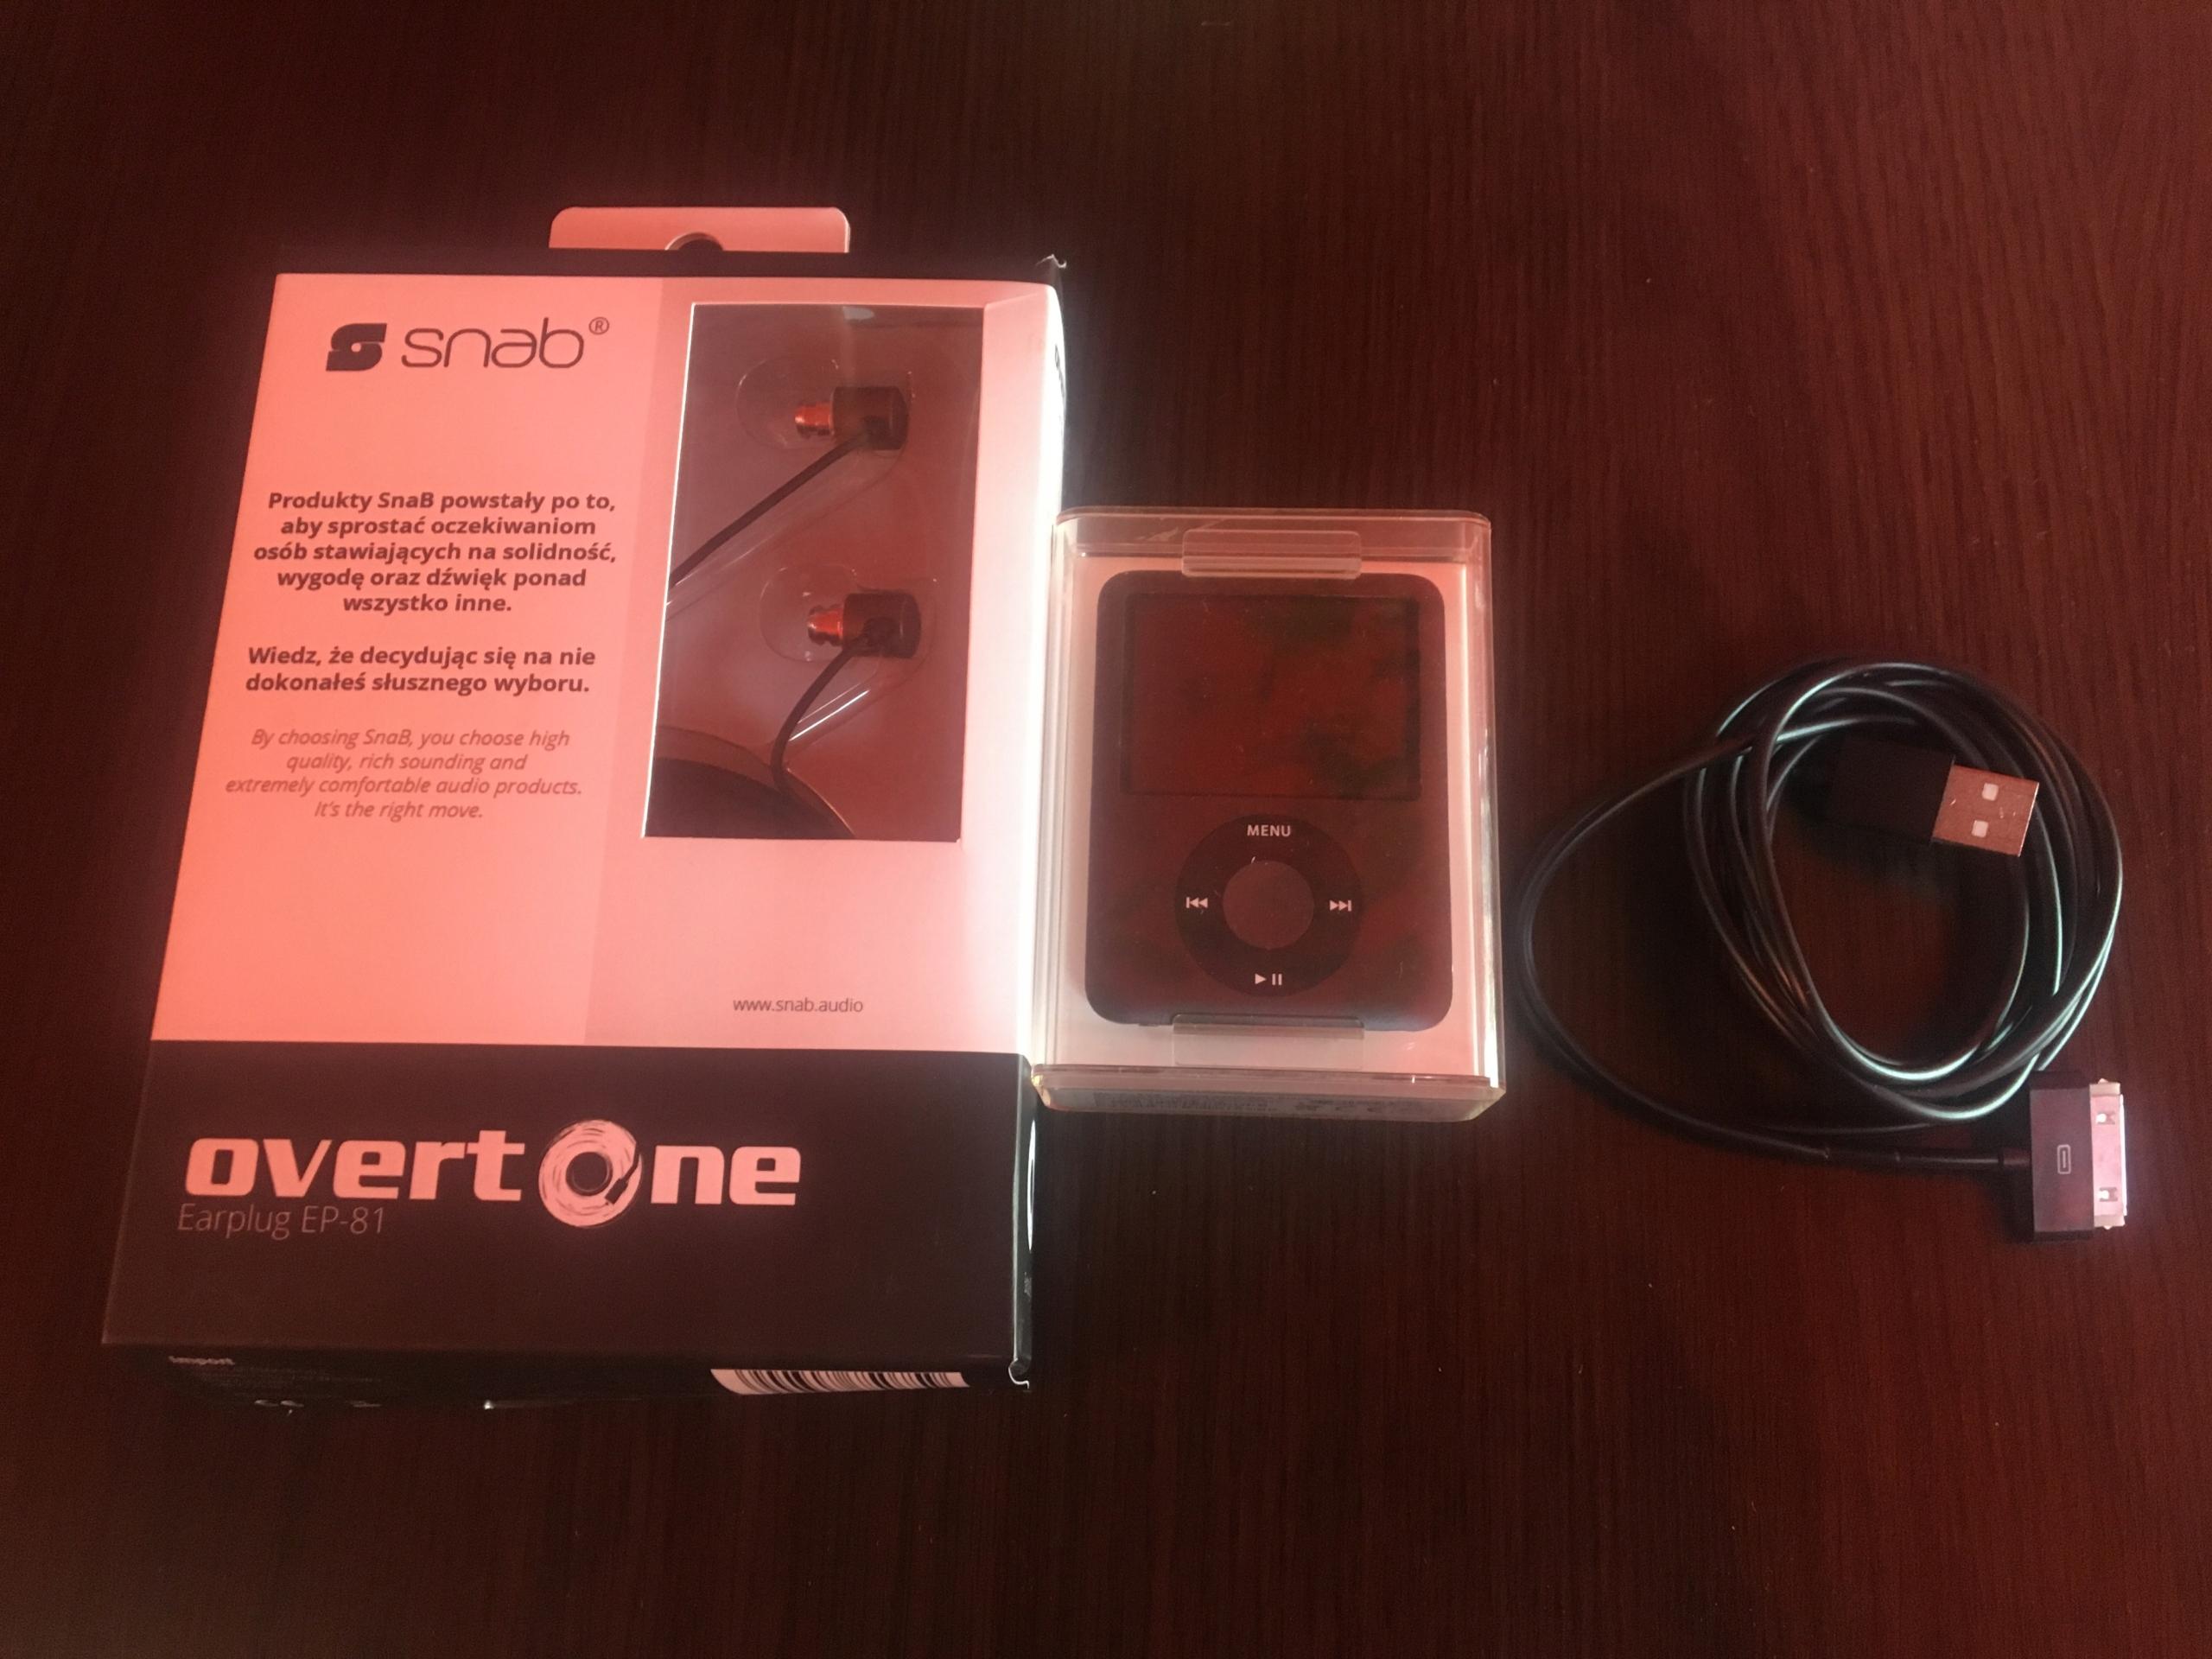 iPod nano 3g 8gb + słuchawki Snab overtone ep -81